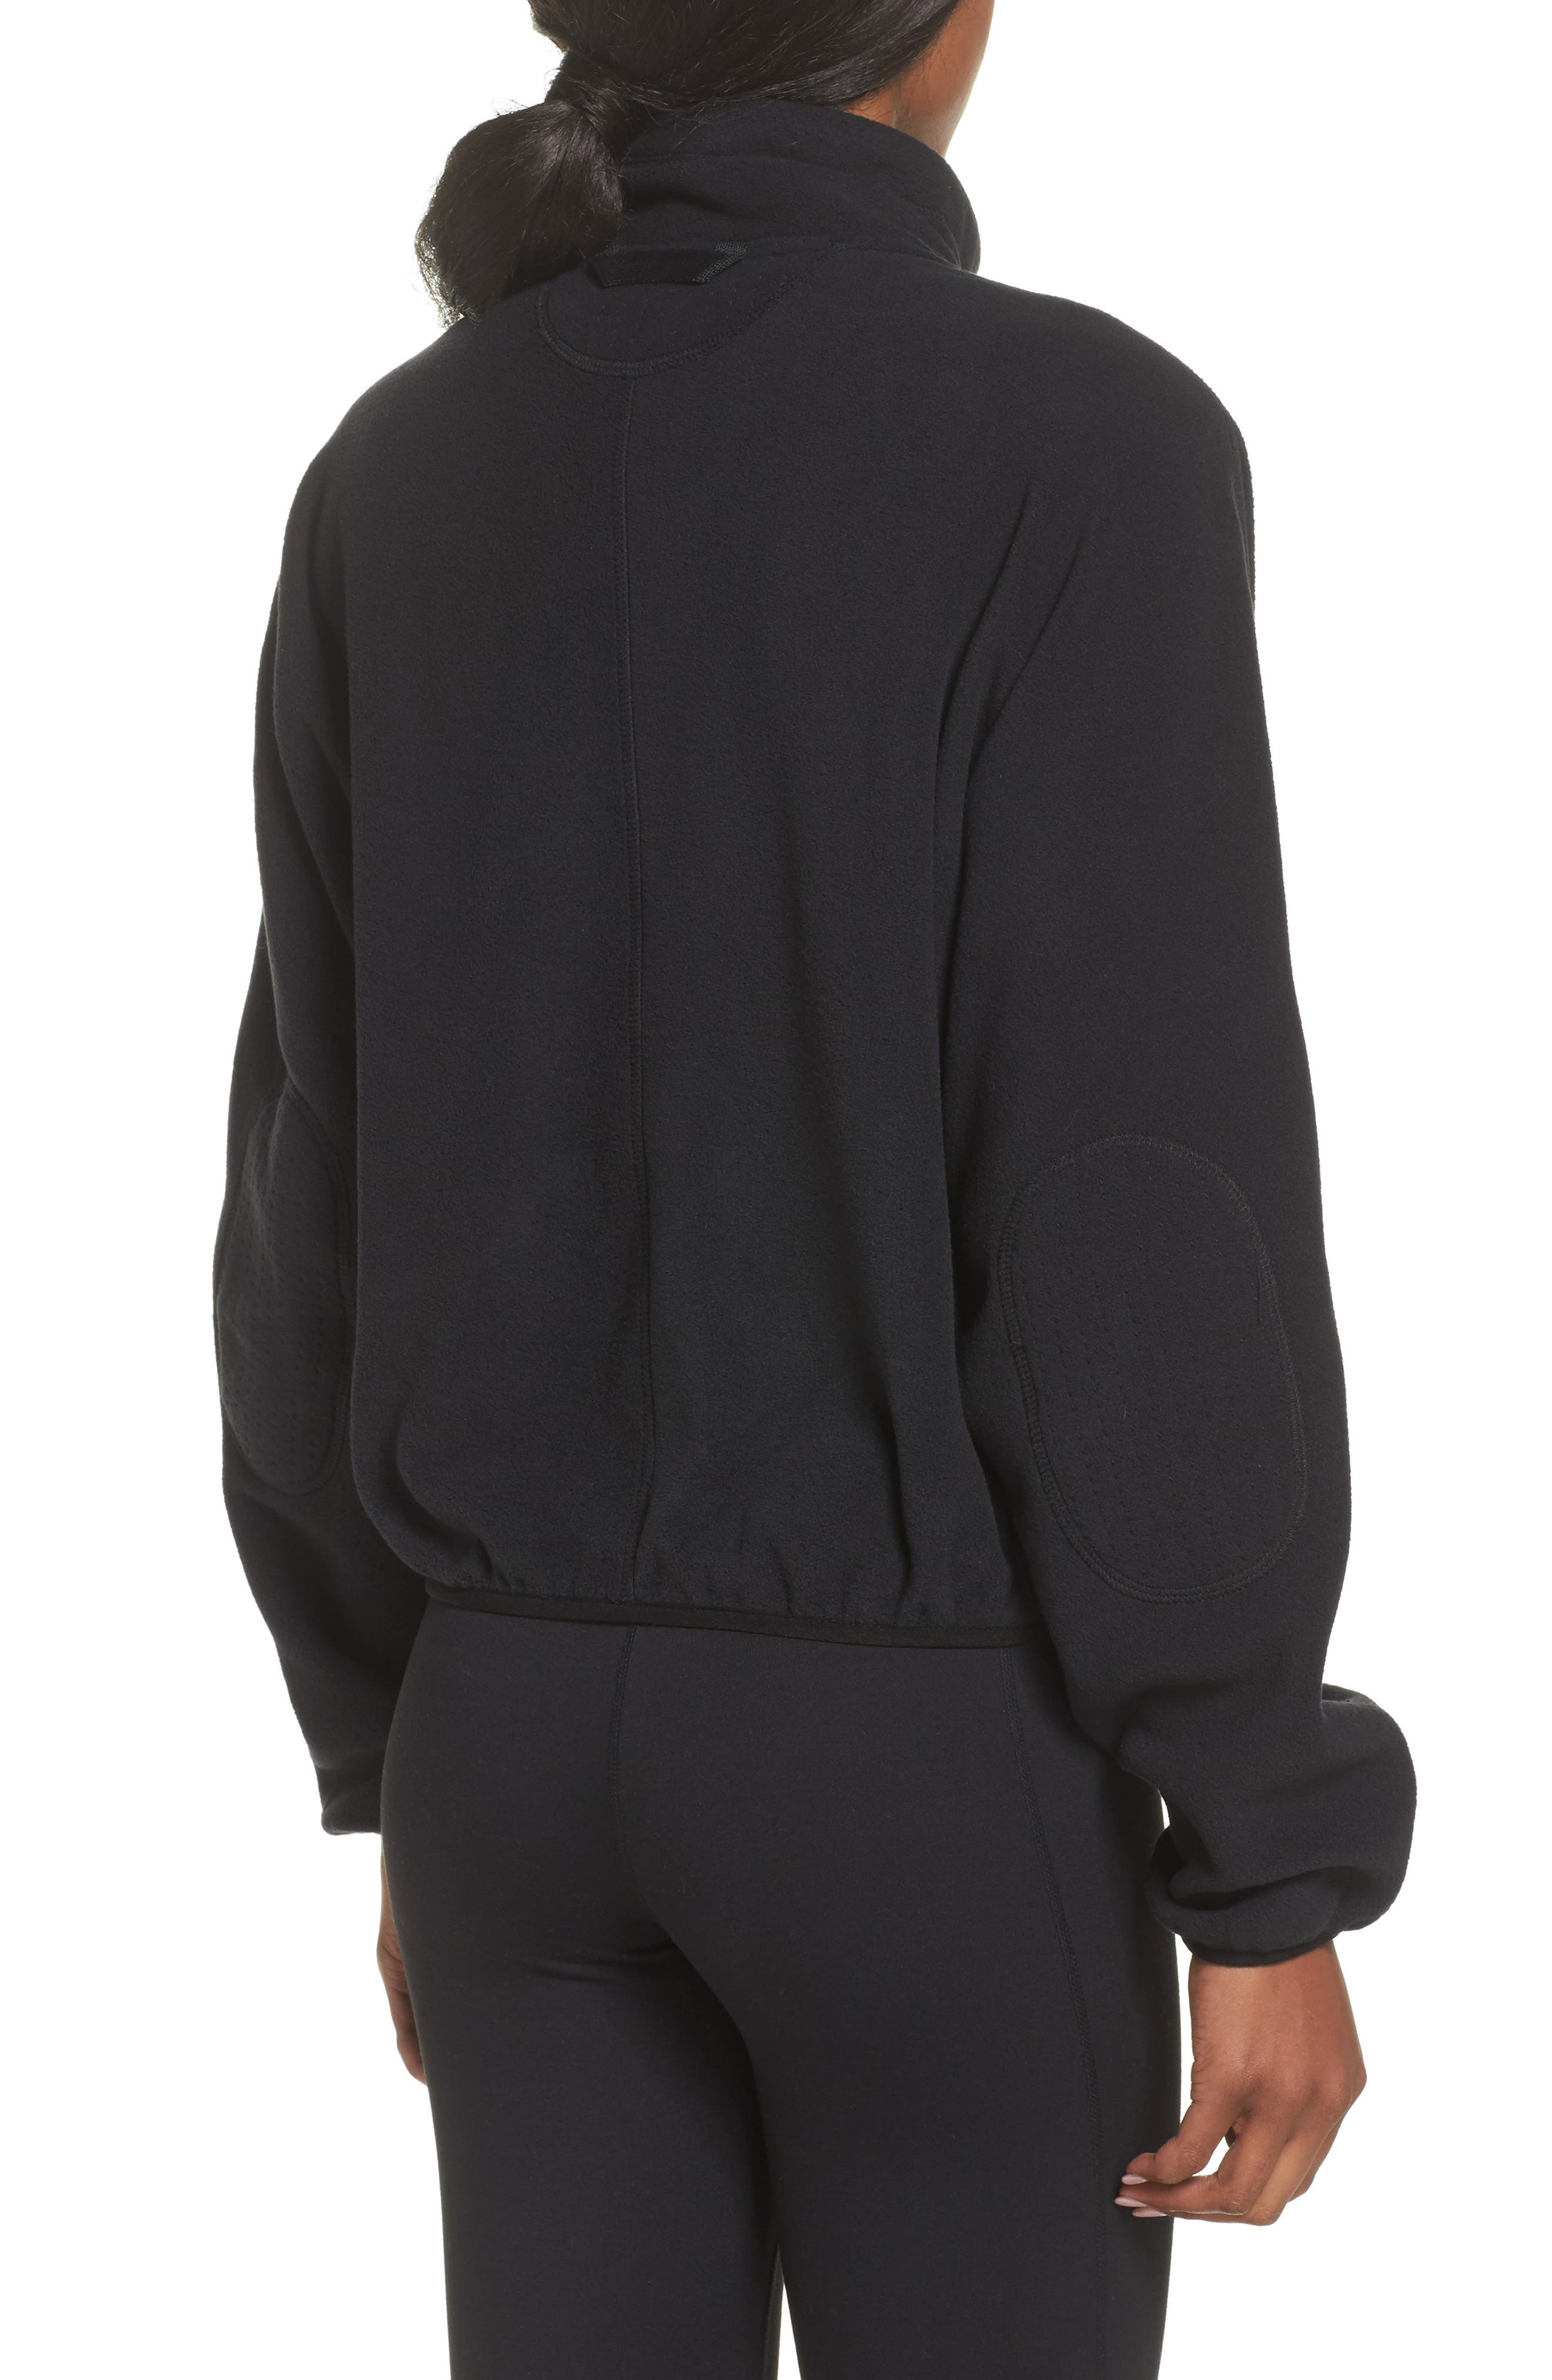 FP Movement Higher Ground Fleece Jacket,                             Alternate thumbnail 3, color,